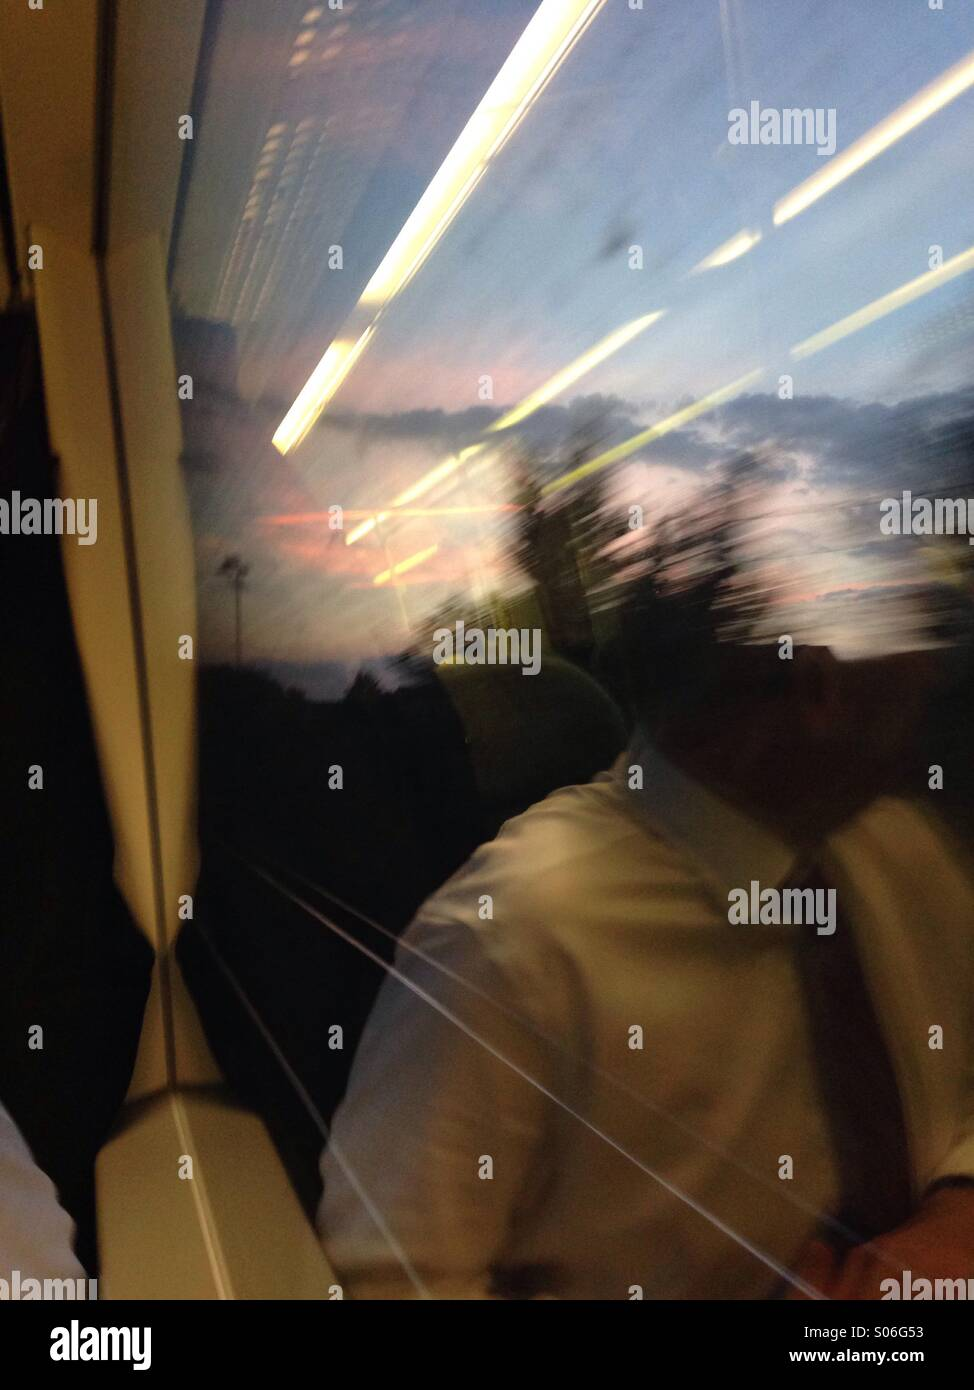 Commute - Stock Image